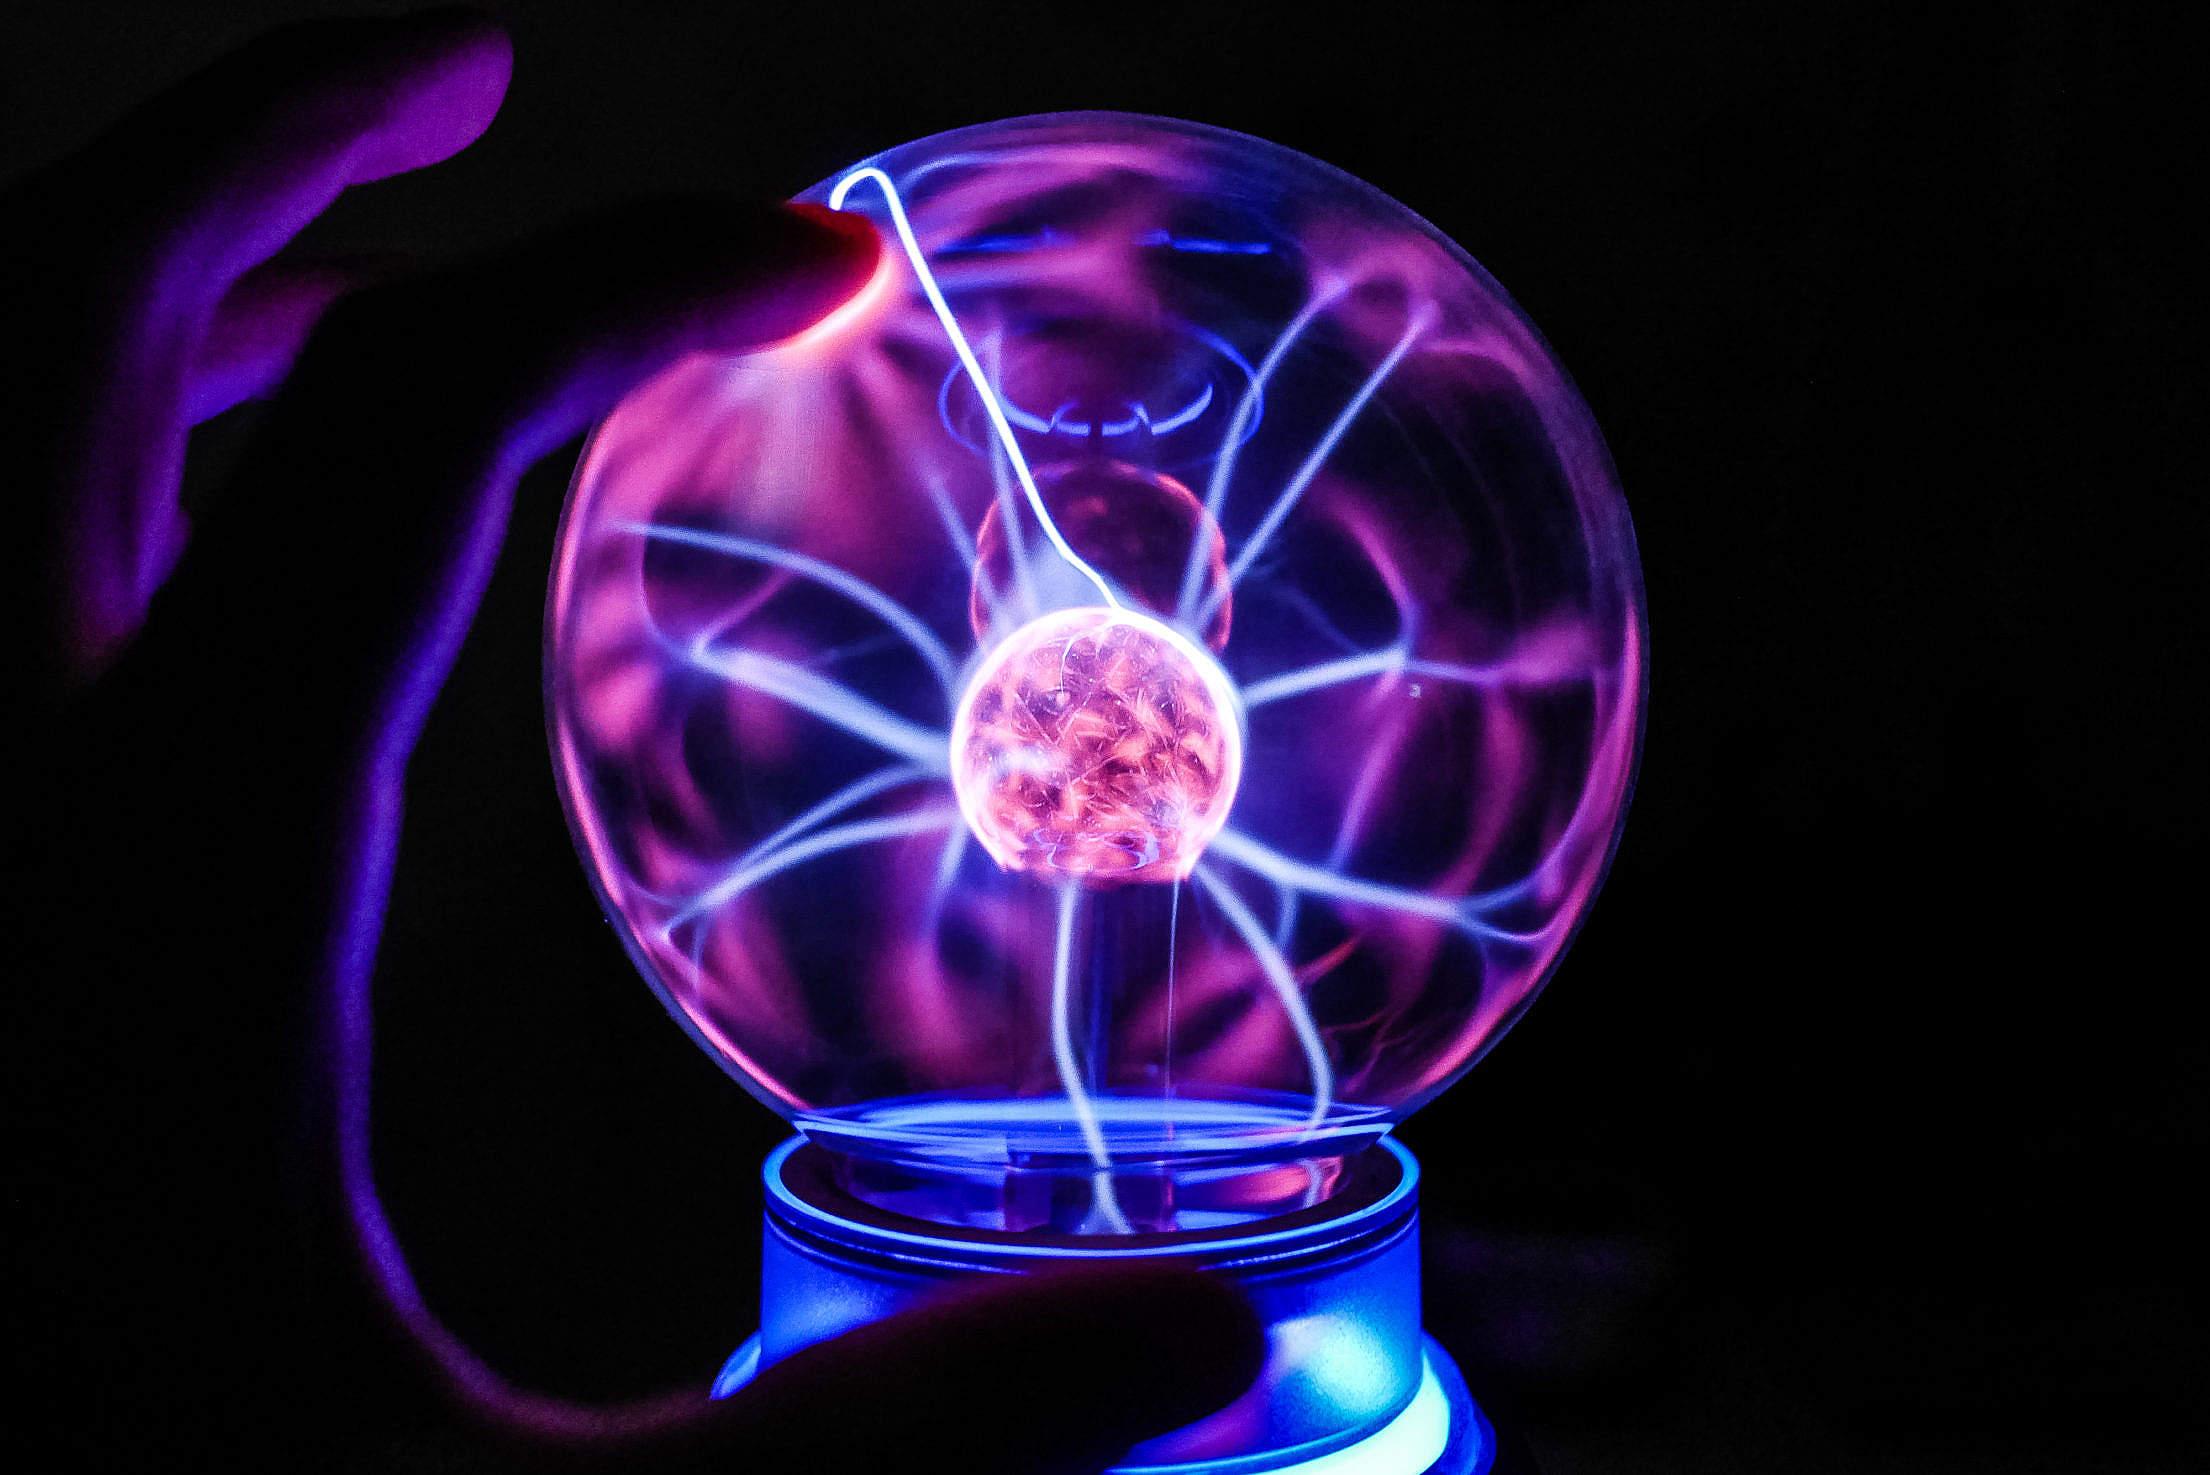 Touching The Plasma Ball Lamp Free Stock Photo